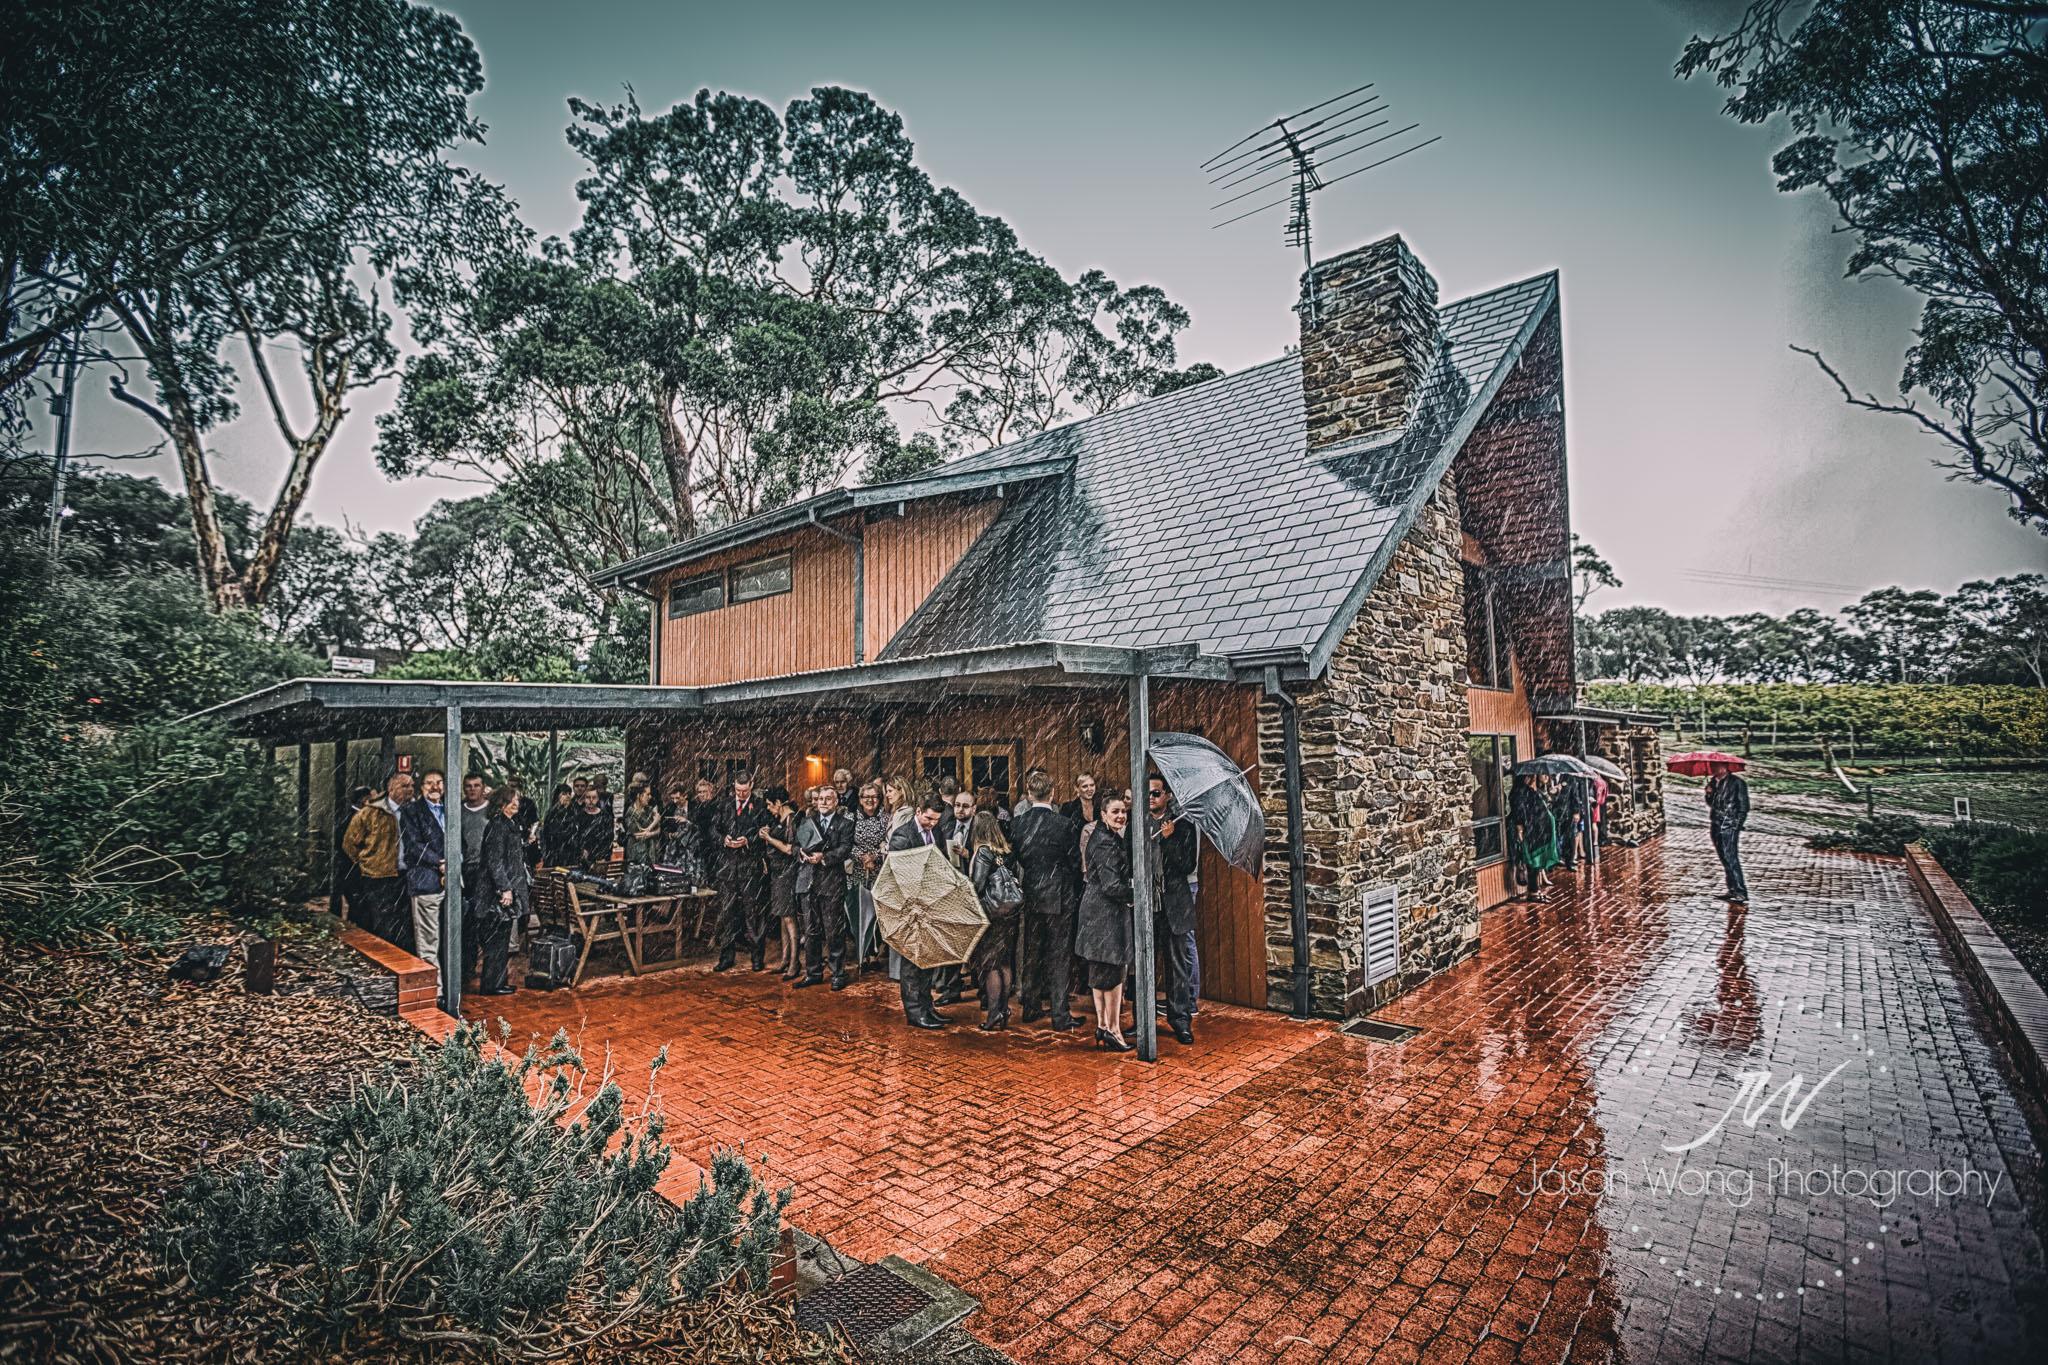 guests-avoiding-rain-at-chapel-hill-wedding-ceremony.jpg